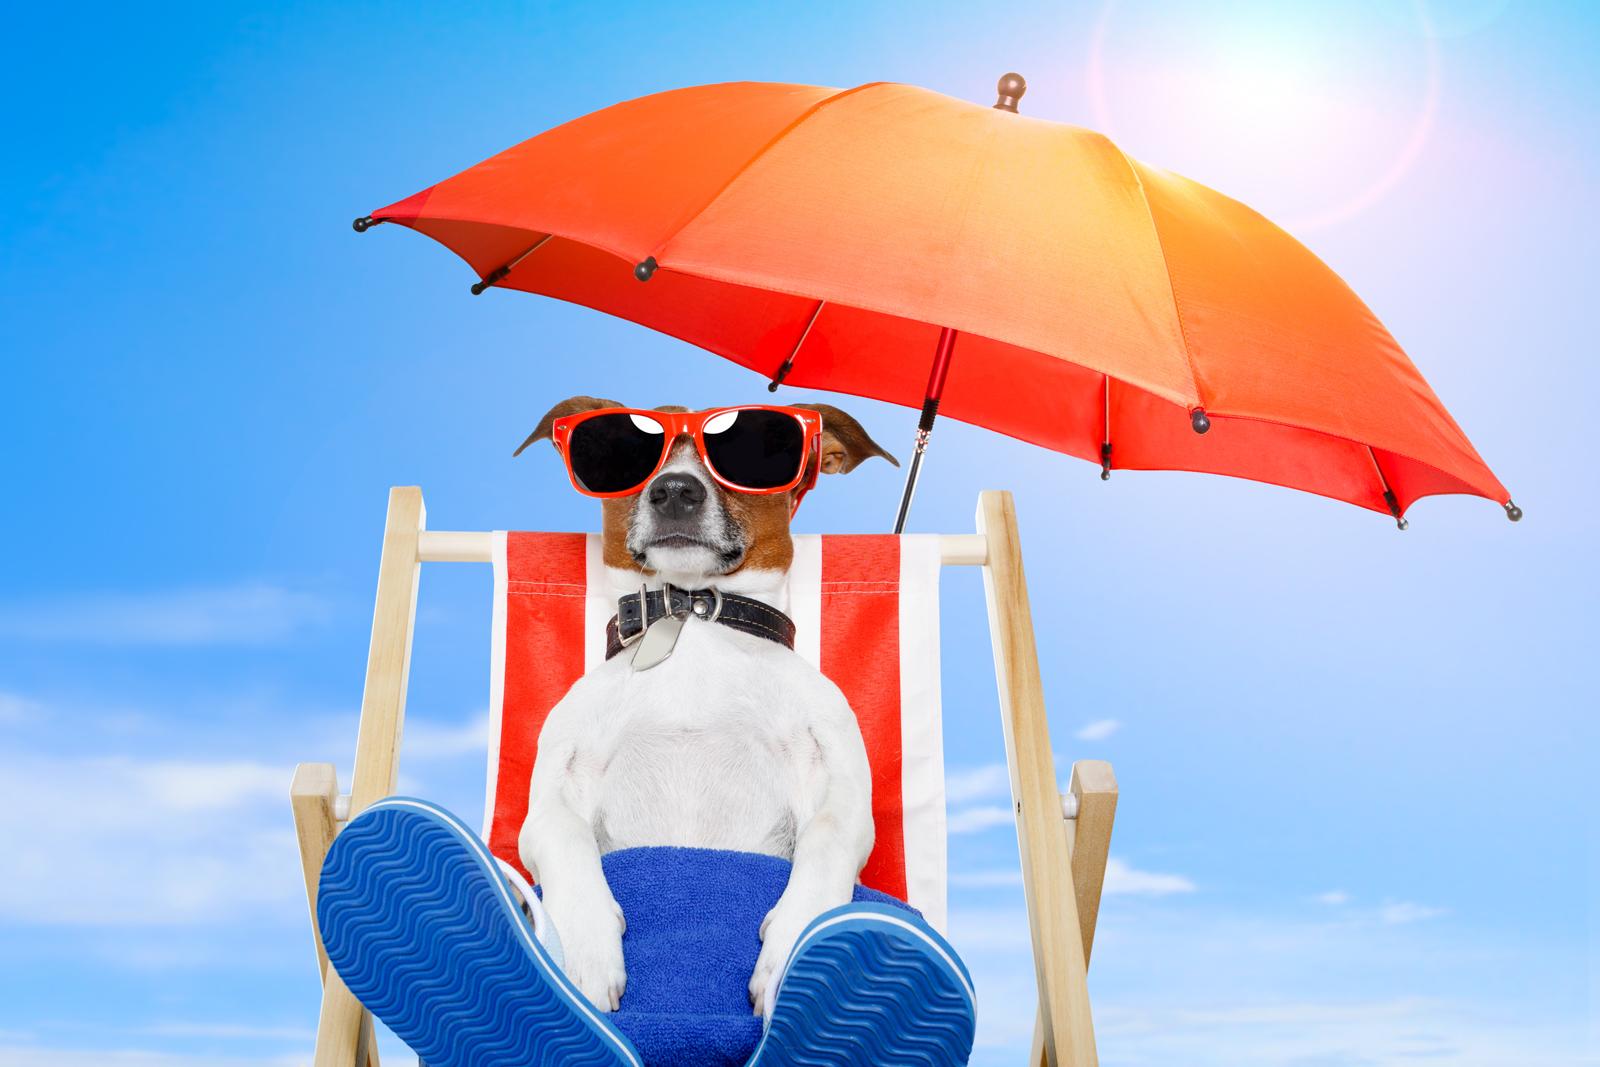 Jack Russell Terrier Cute Puppies Wallpaper Dog Sunbathing On A Deck Chair Khoirulpage